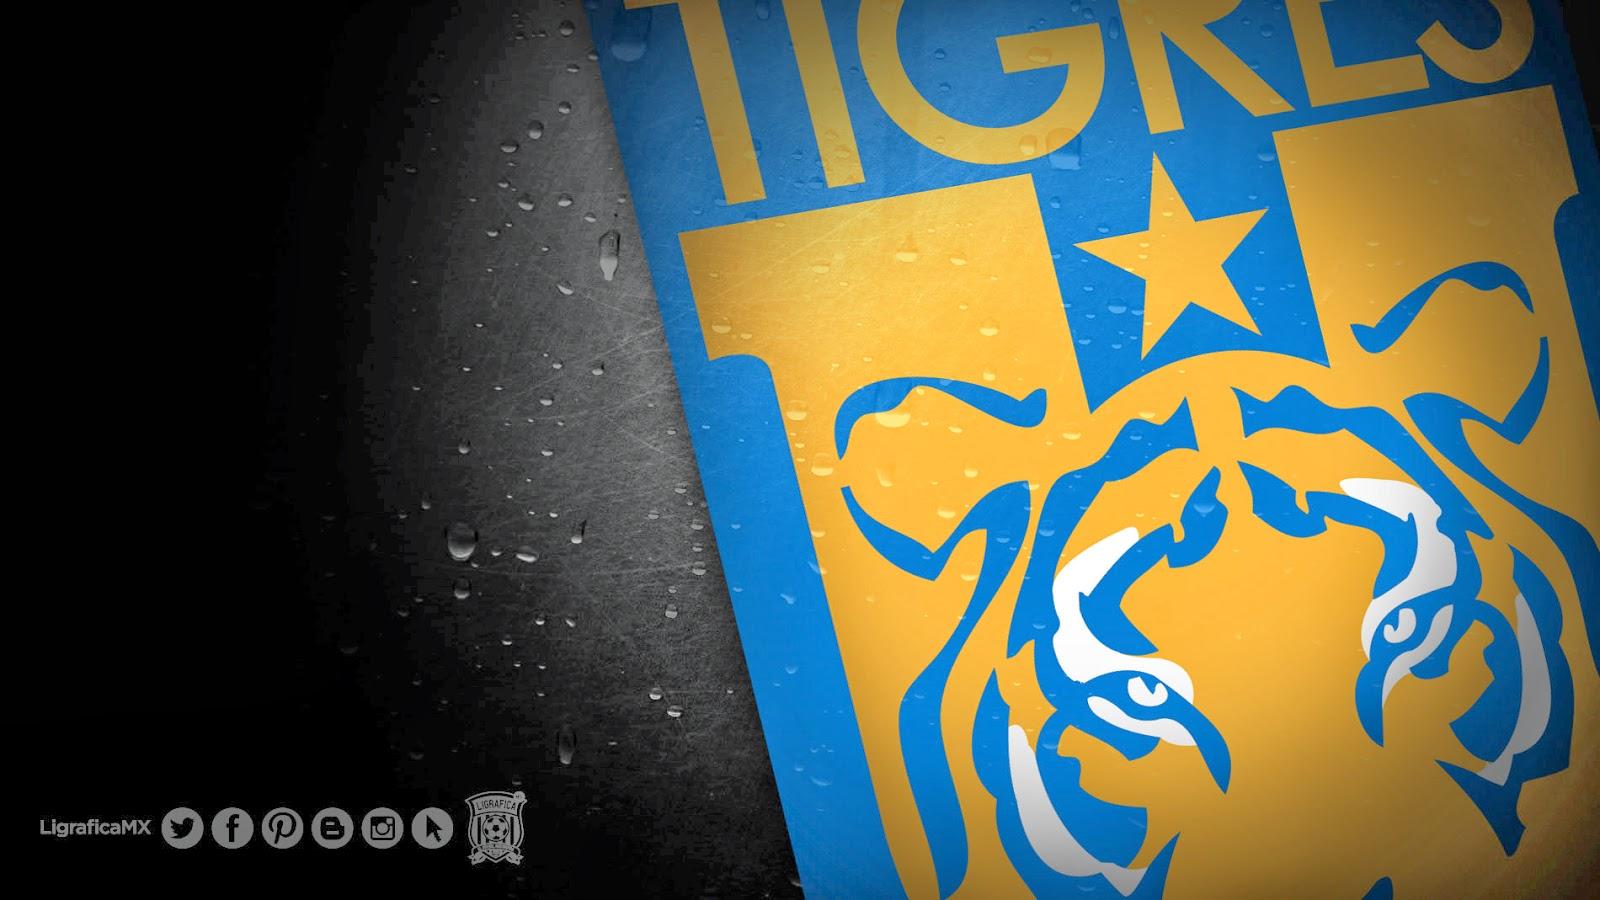 ligabancomermx 130314 5 Tigres.